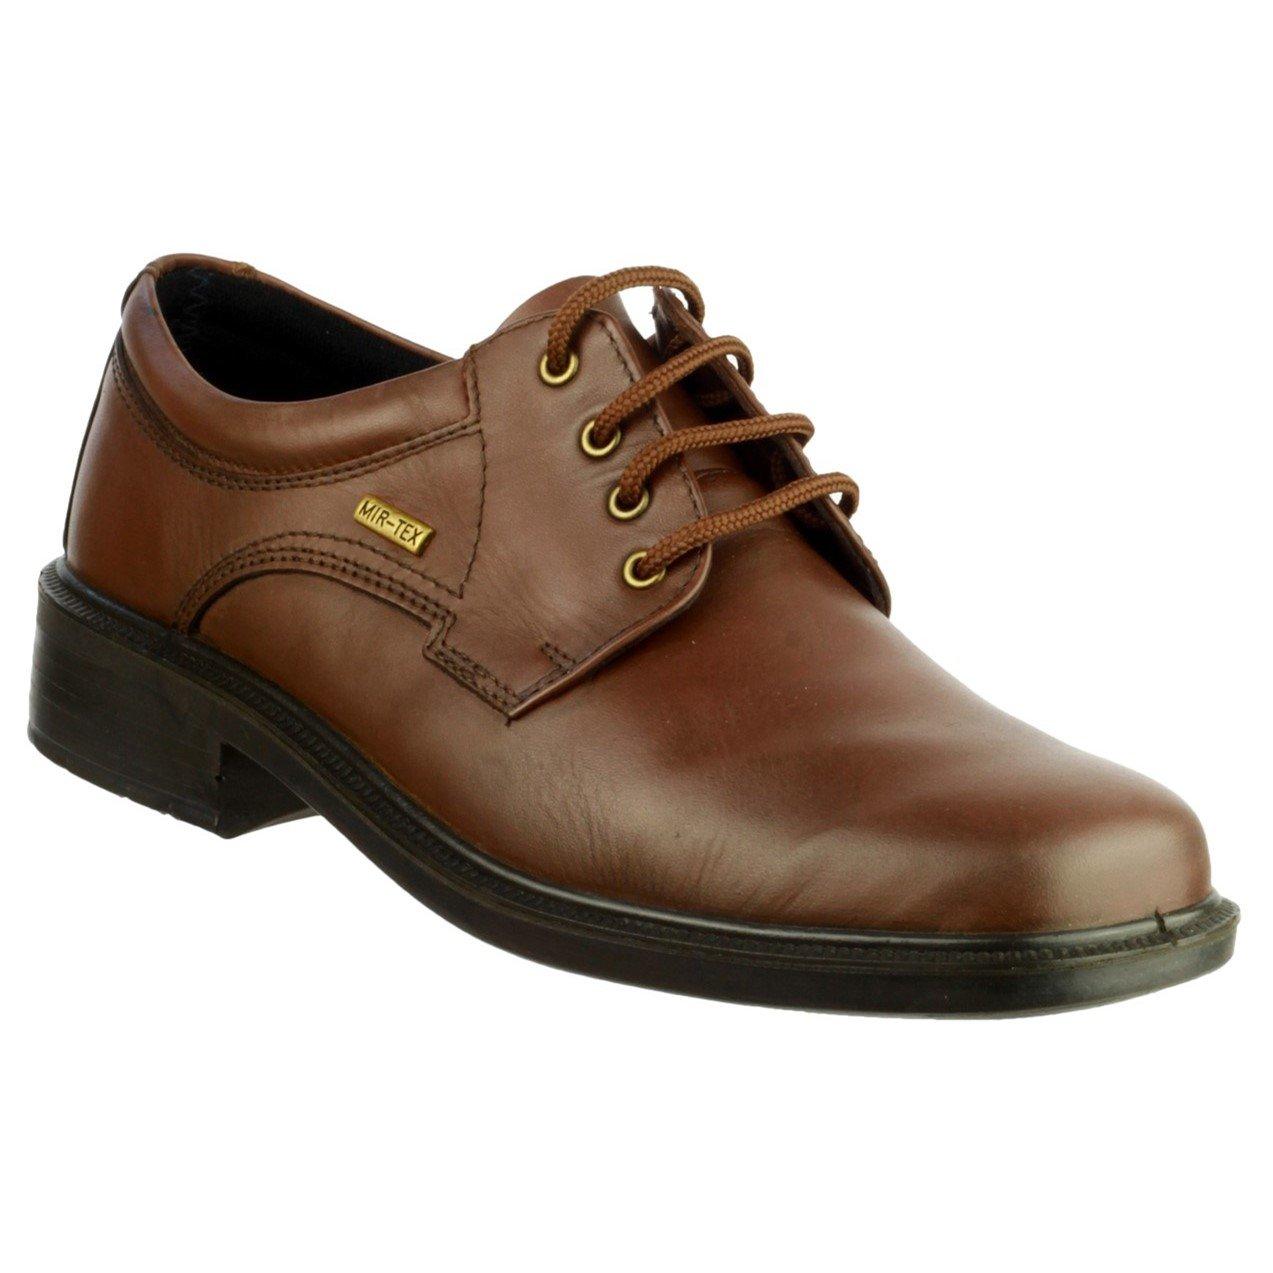 Cotswold Men's Sudeley Waterproof Shoe Various Colours 32970 - Brown 7